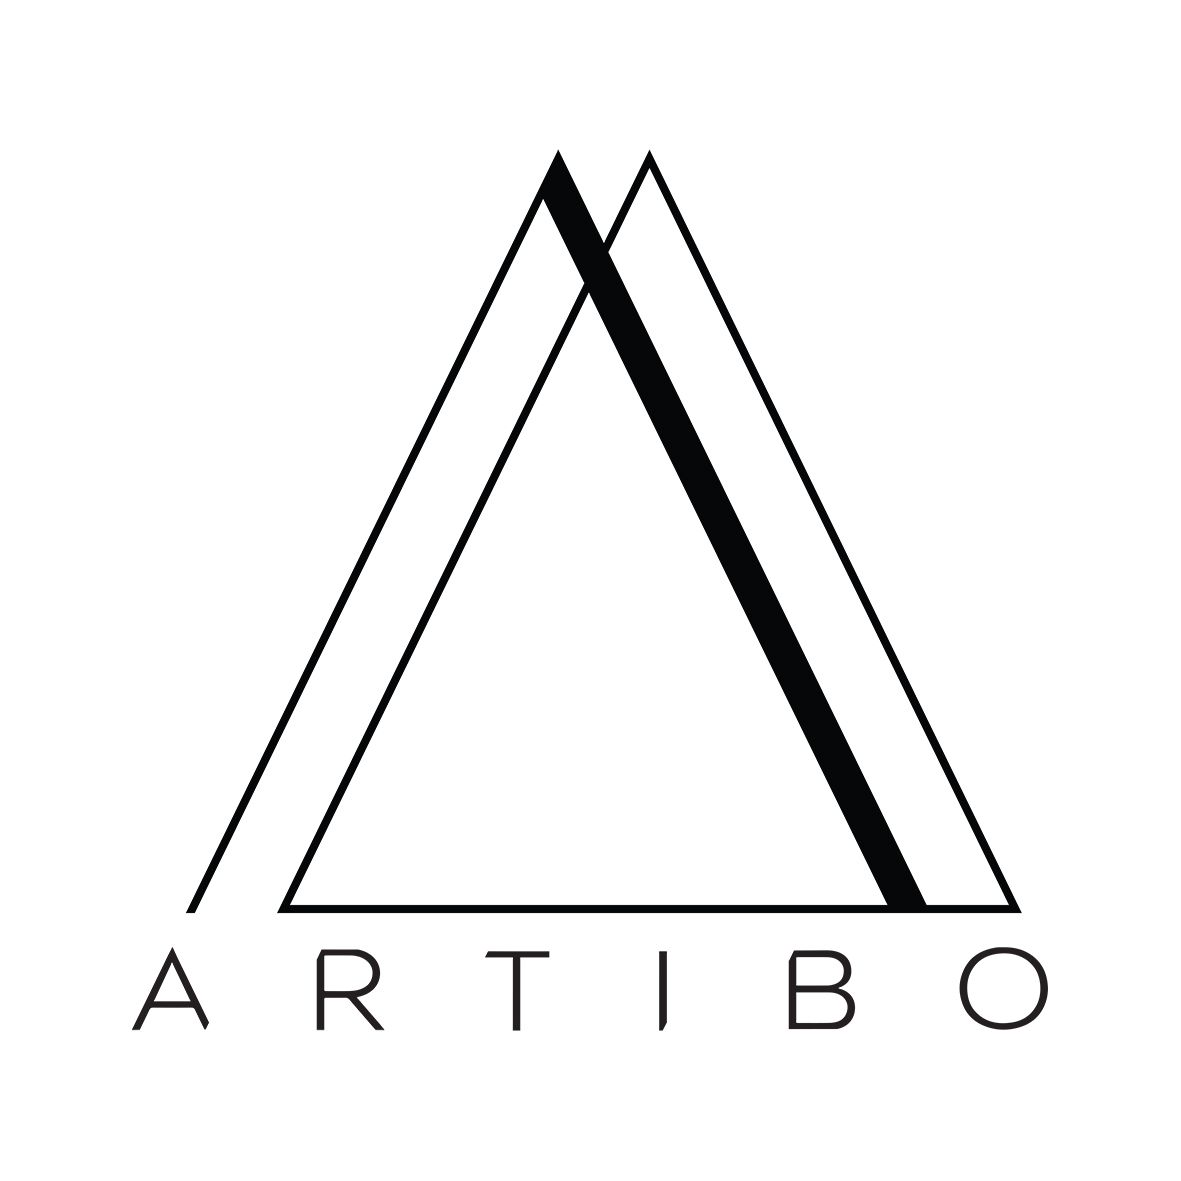 Artibo